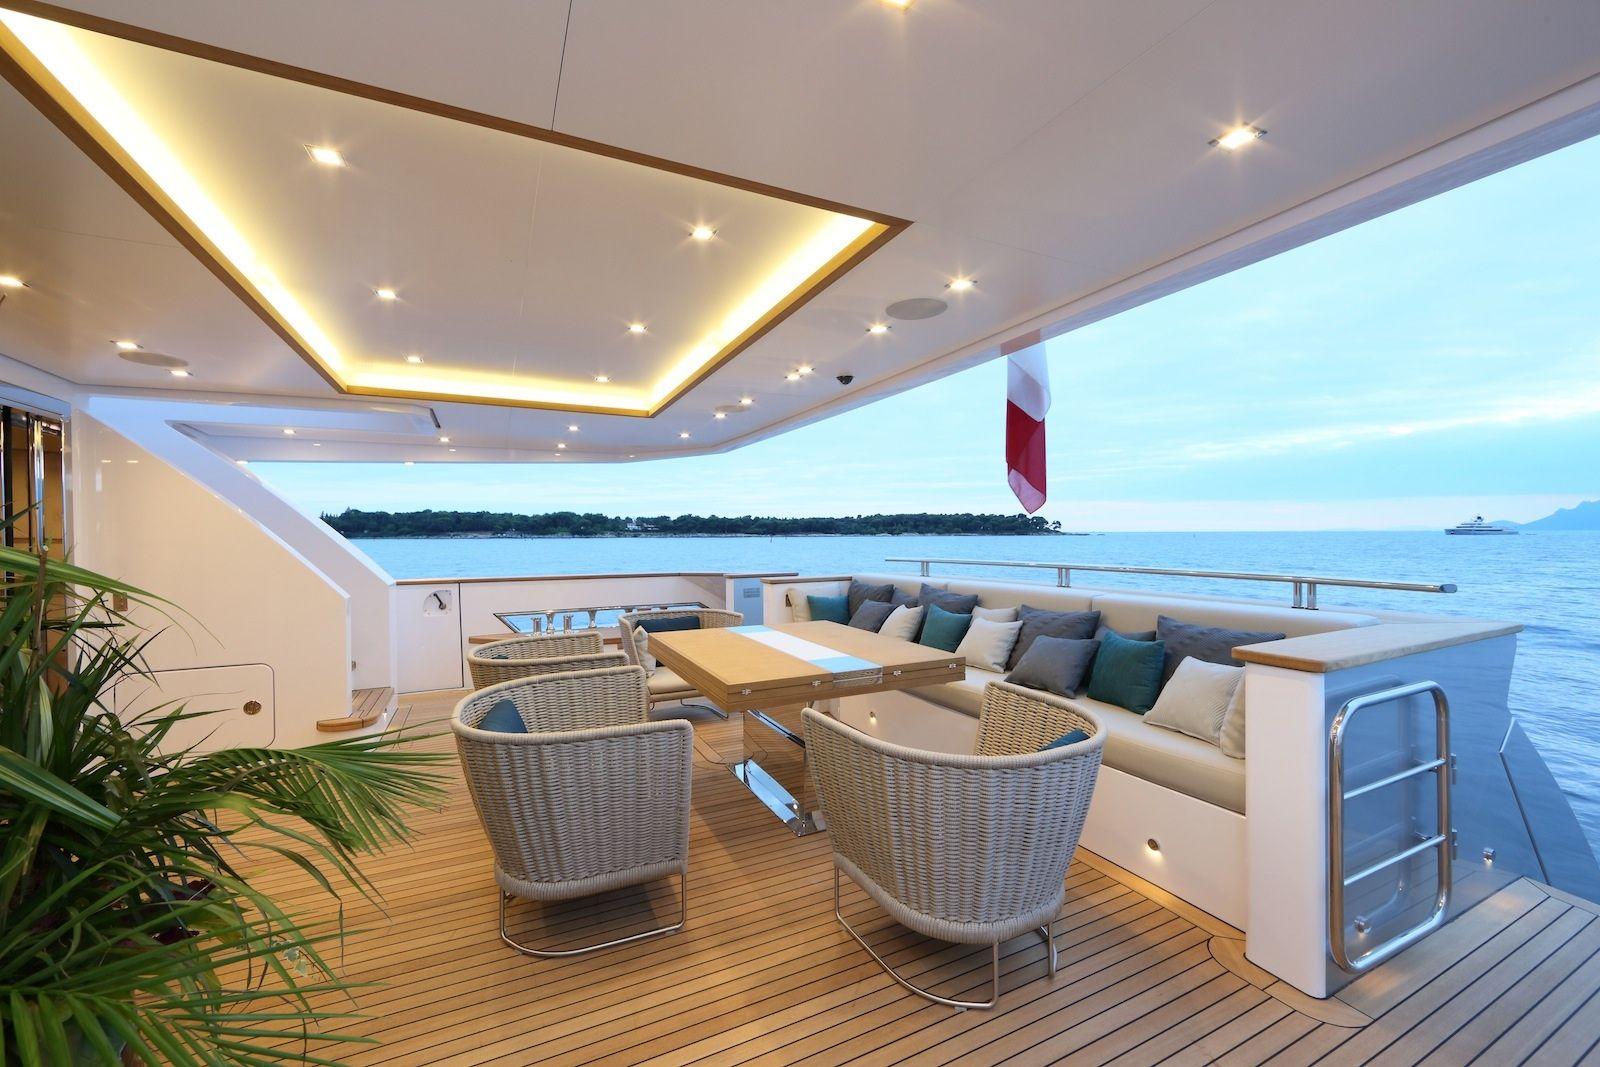 Luxury superyacht keyla interior by hot lab luxury yacht charter - Columbus 40s Hybrid Interior Design By Hot Lab